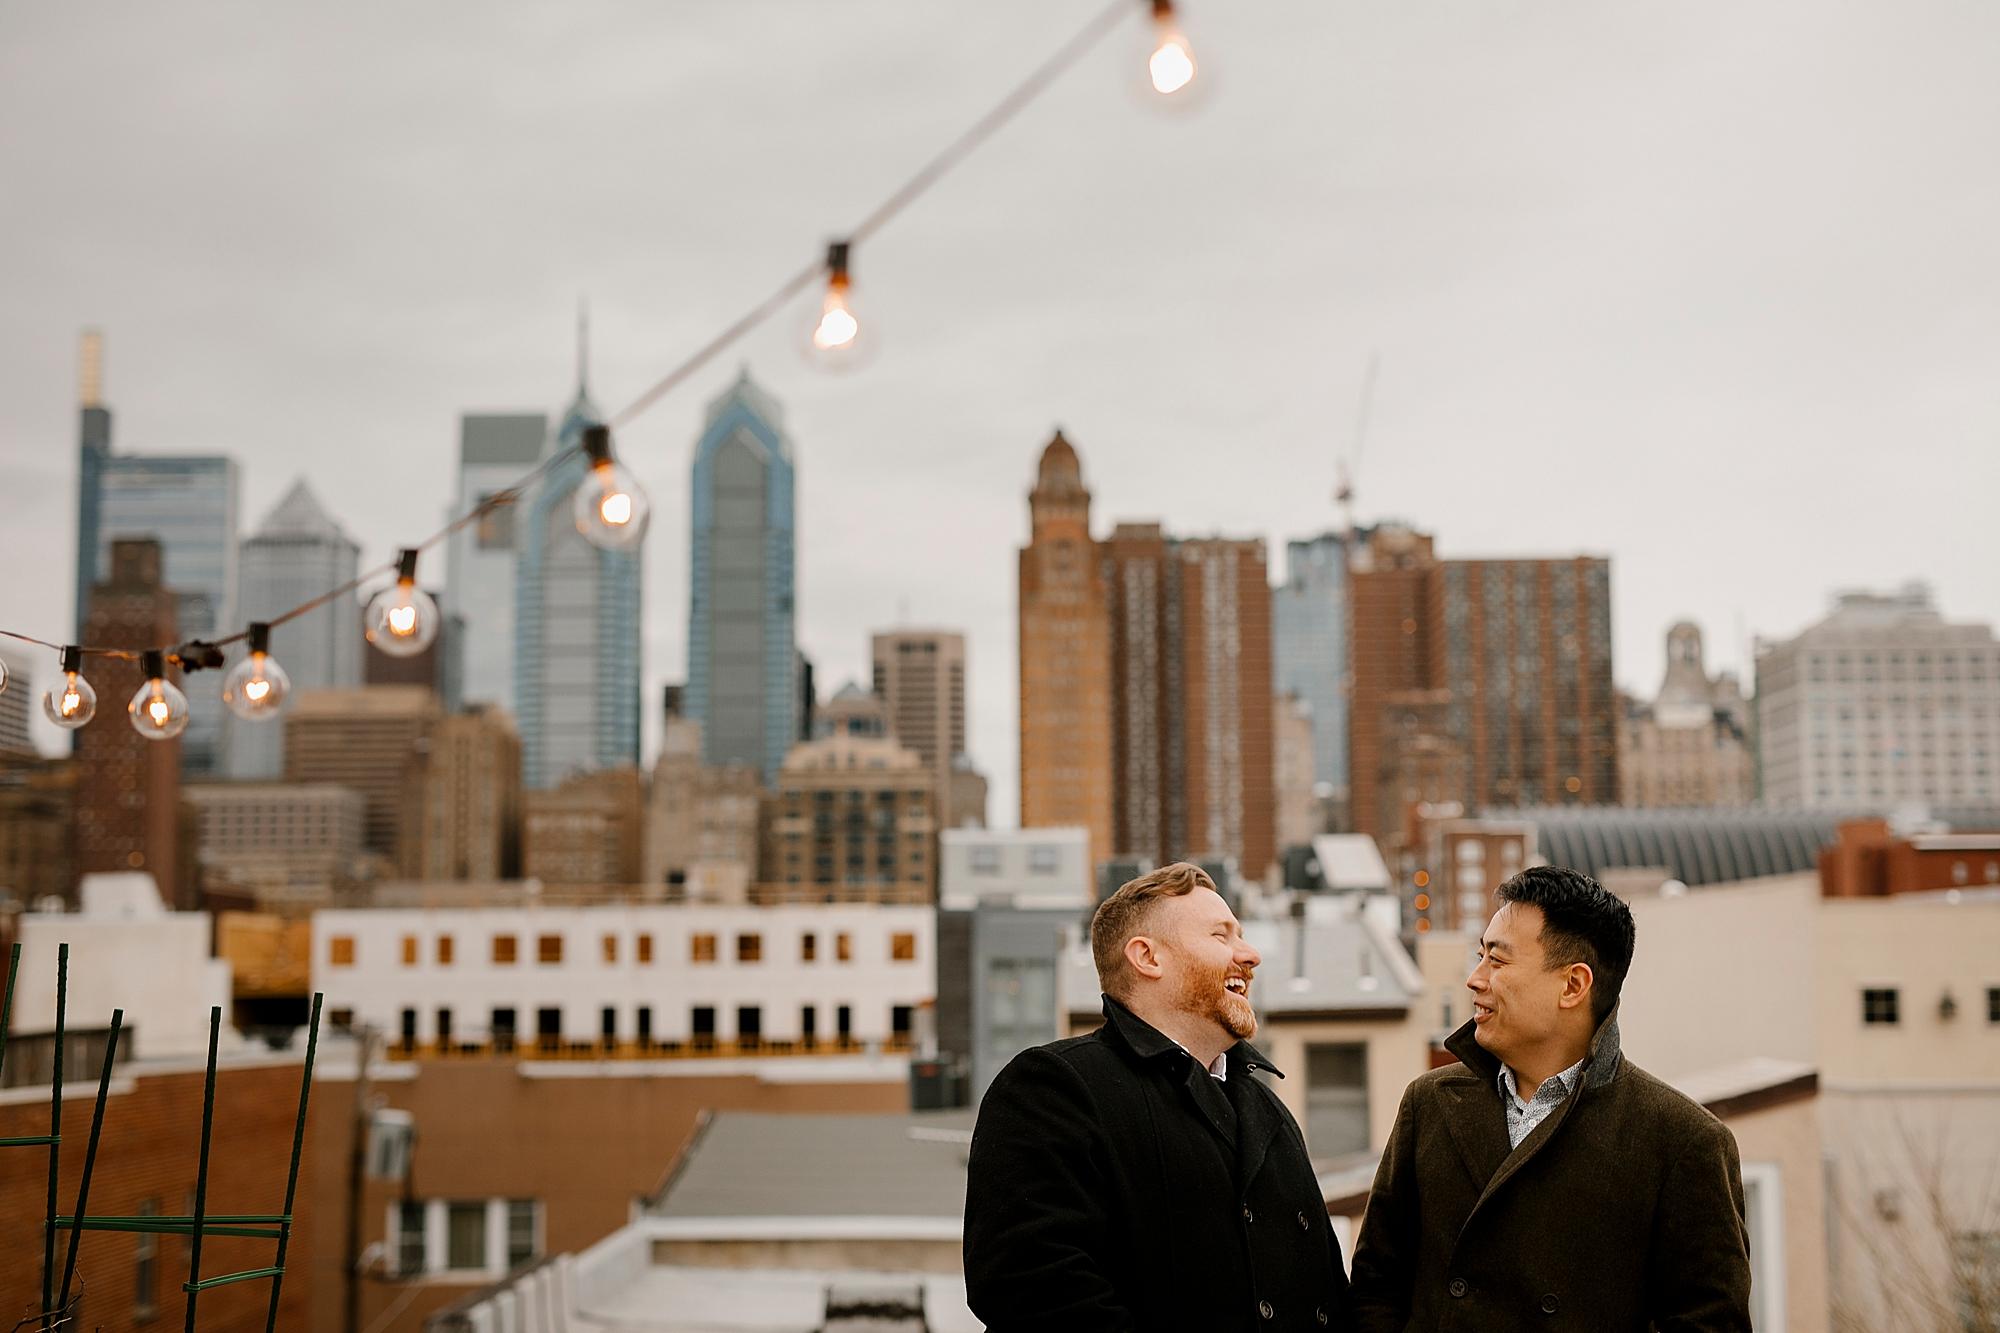 Love_BY_Joe_Mac_Creative_Philadelphia_Philly_Wedding_Photography_Gay_LGBT_Queer_Washington_Square_Park_Philadelphia__0045.jpg